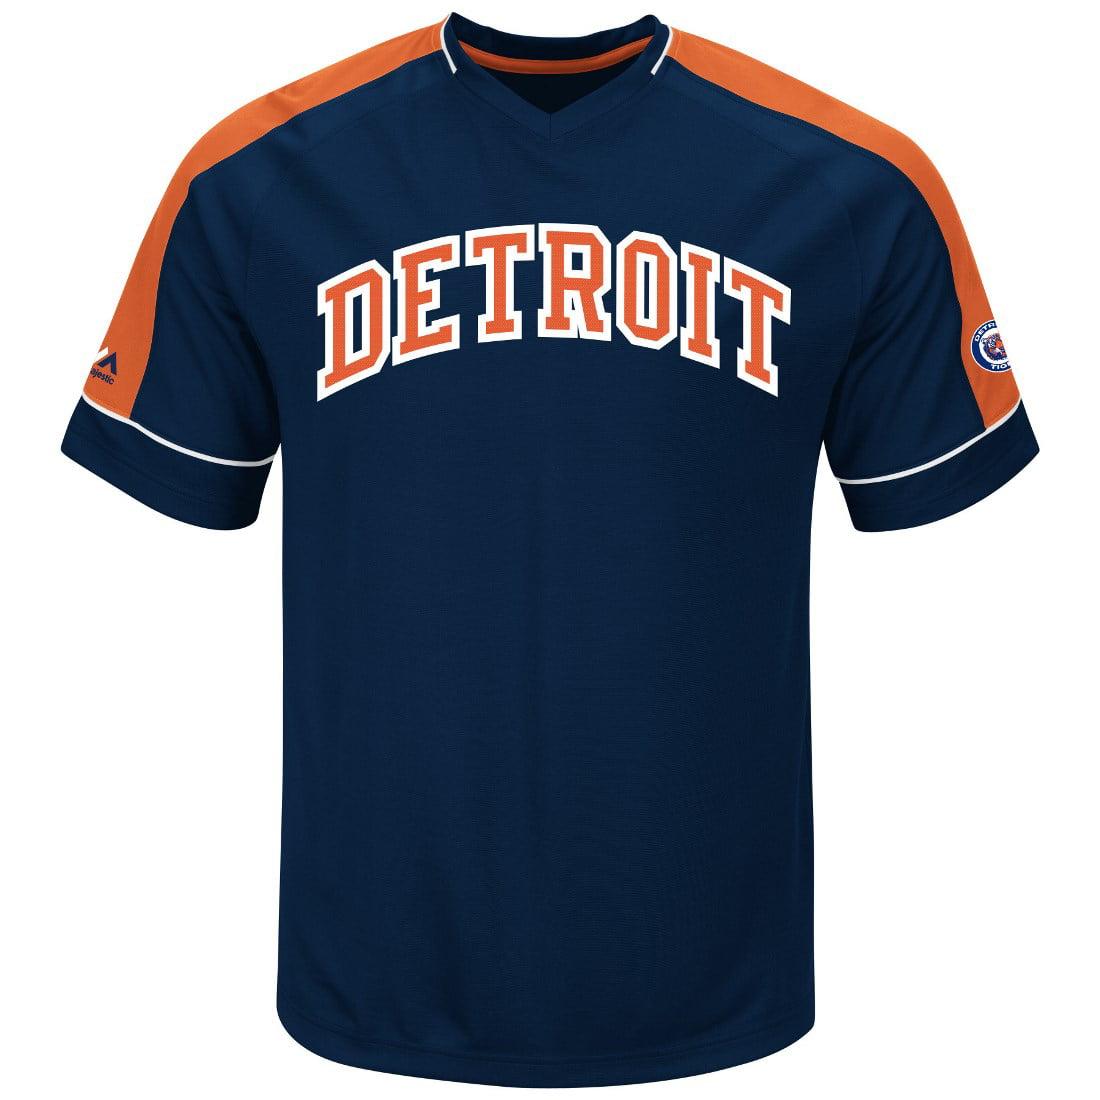 "Detroit Tigers Majestic MLB ""Tandem"" Cooperstown V-Neck Men's Fashion Jersey"